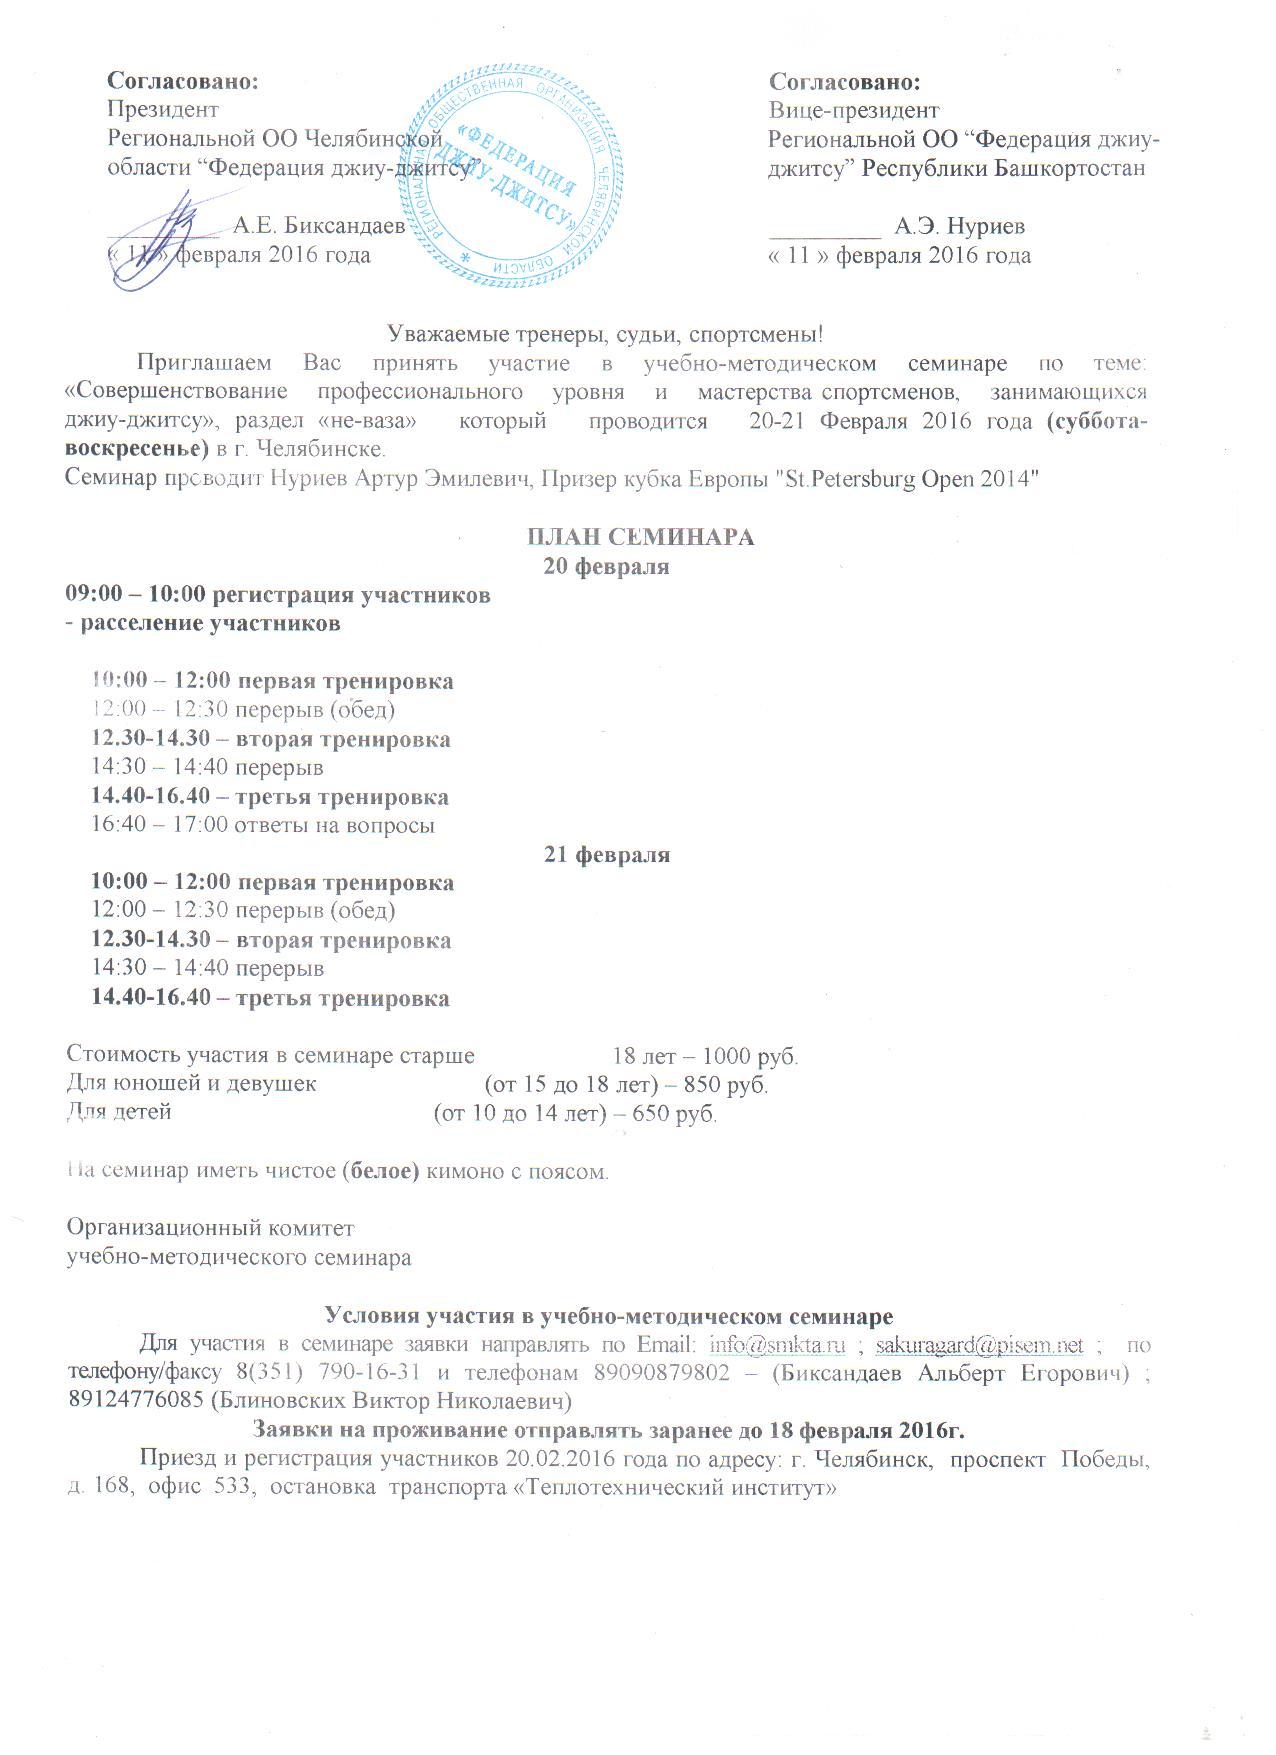 семинар не-ваза Челябинск 20-21.02.2016г..jpg